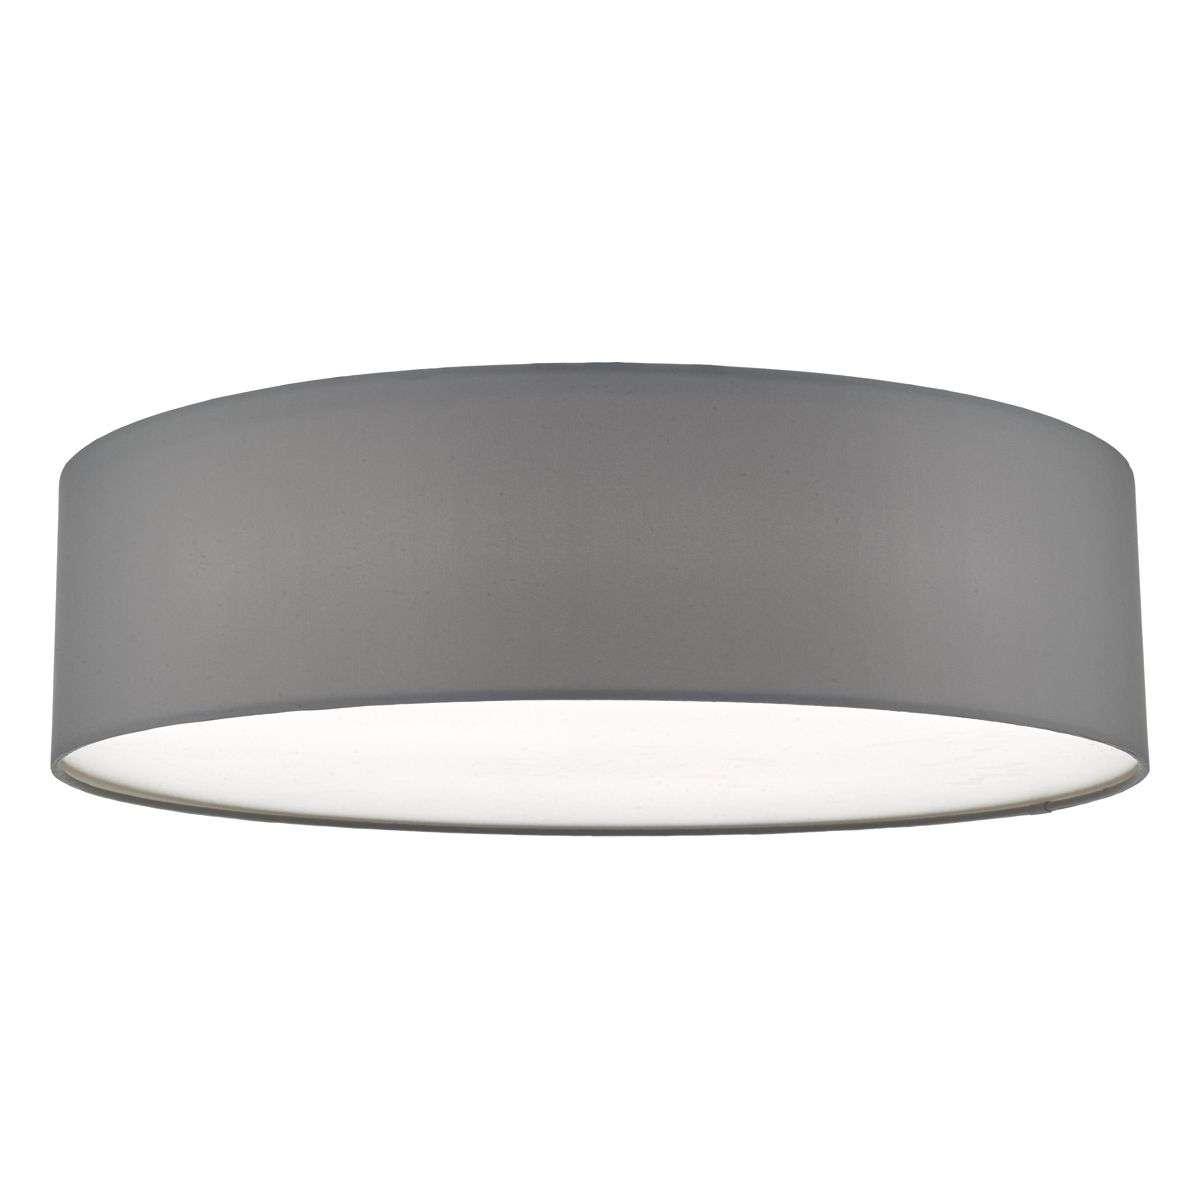 Cierro 4 Light Flush Fitting in Grey